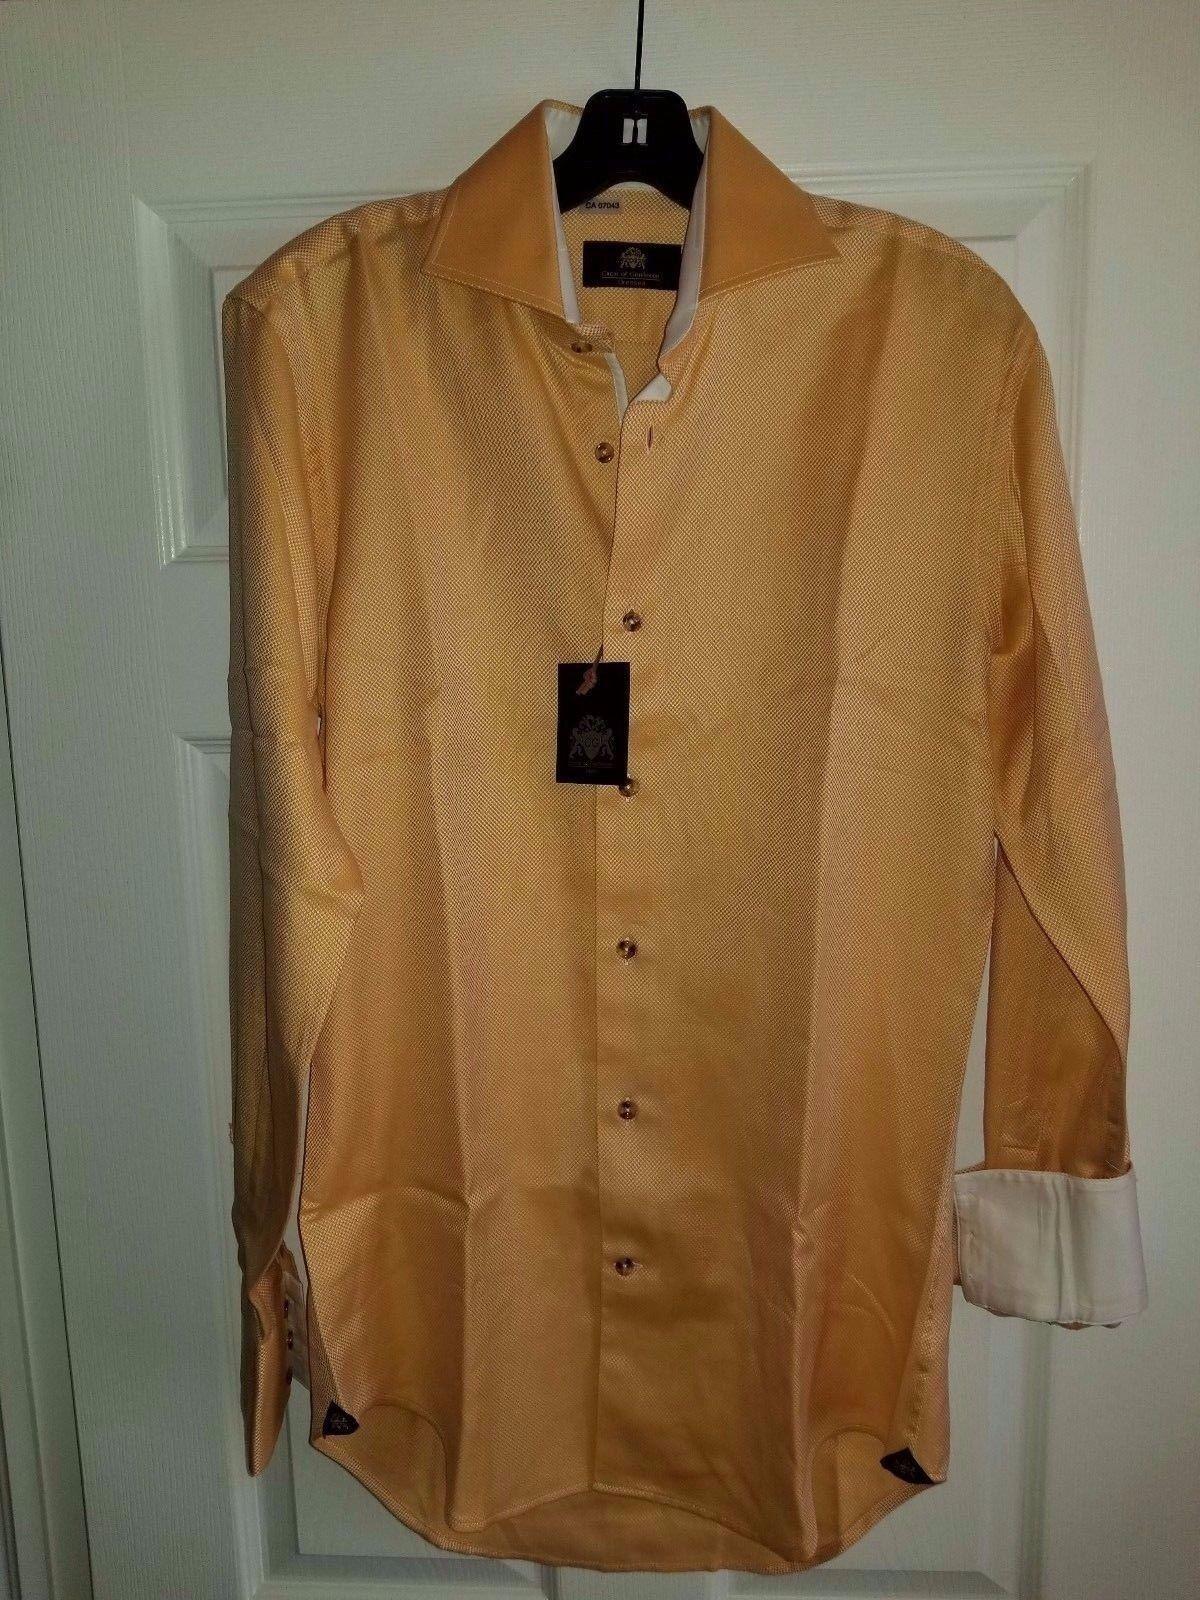 CIRCLE OF GENTLEMEN OSMAR DRESSED SHIRT SIZE 38 15